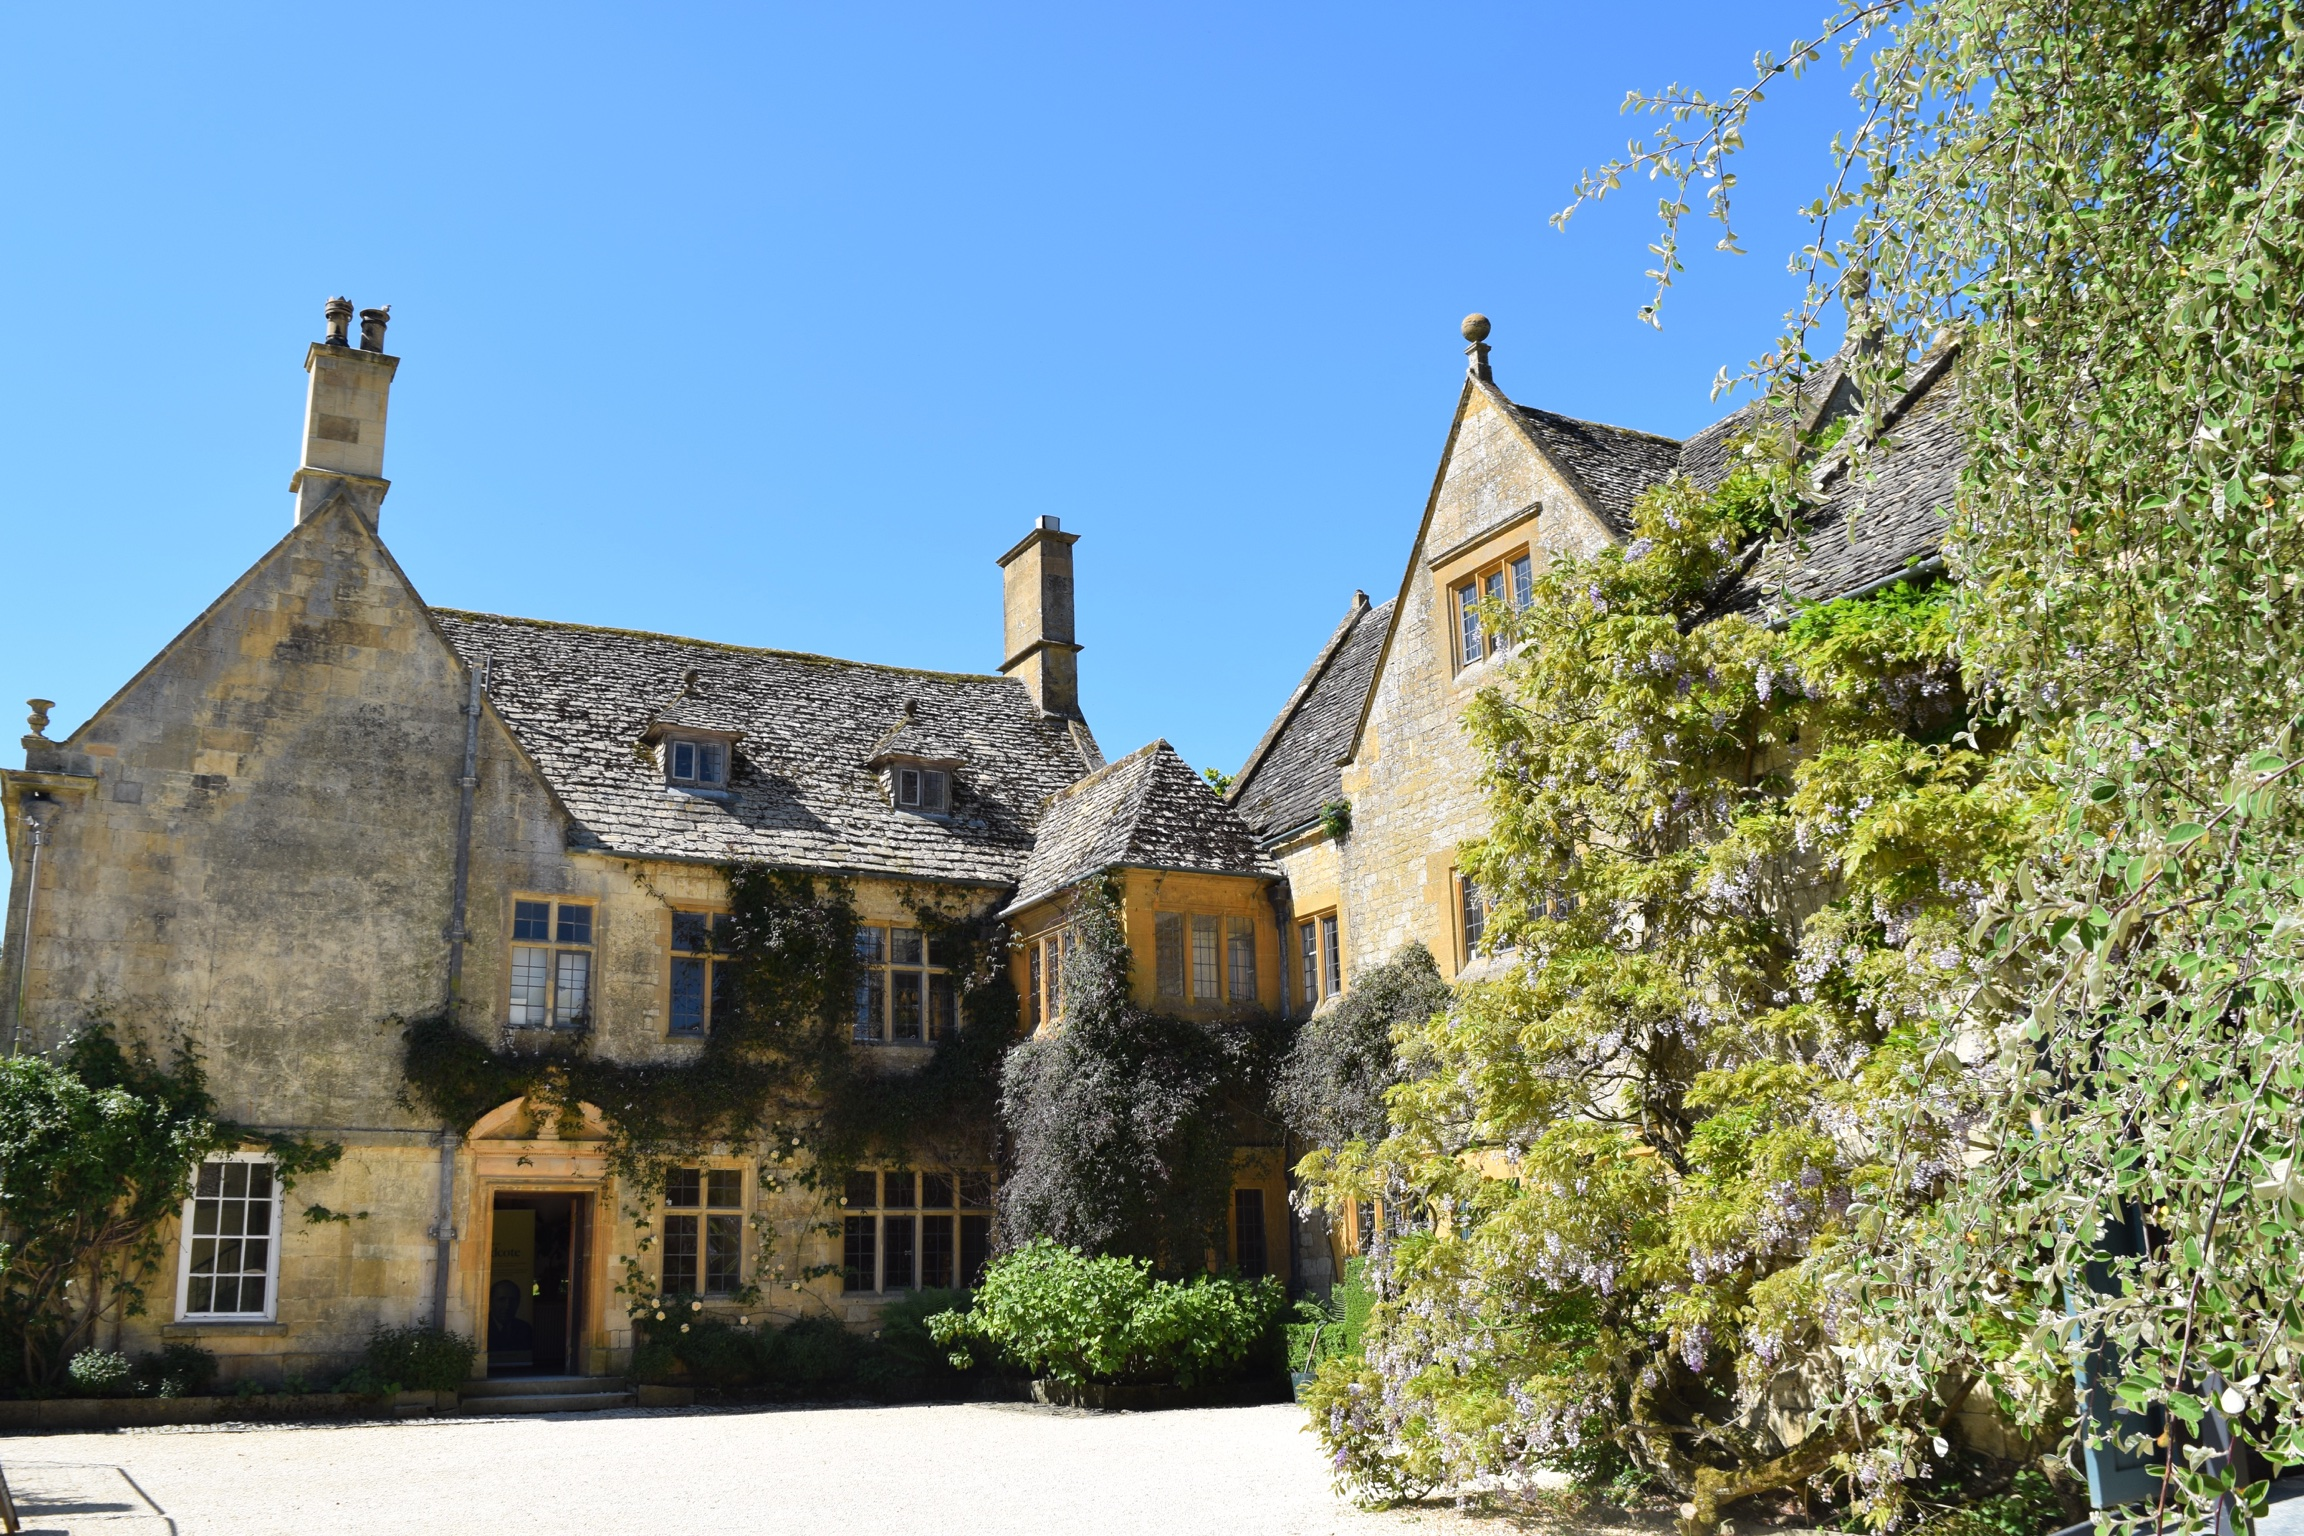 Hidcote Manor House.